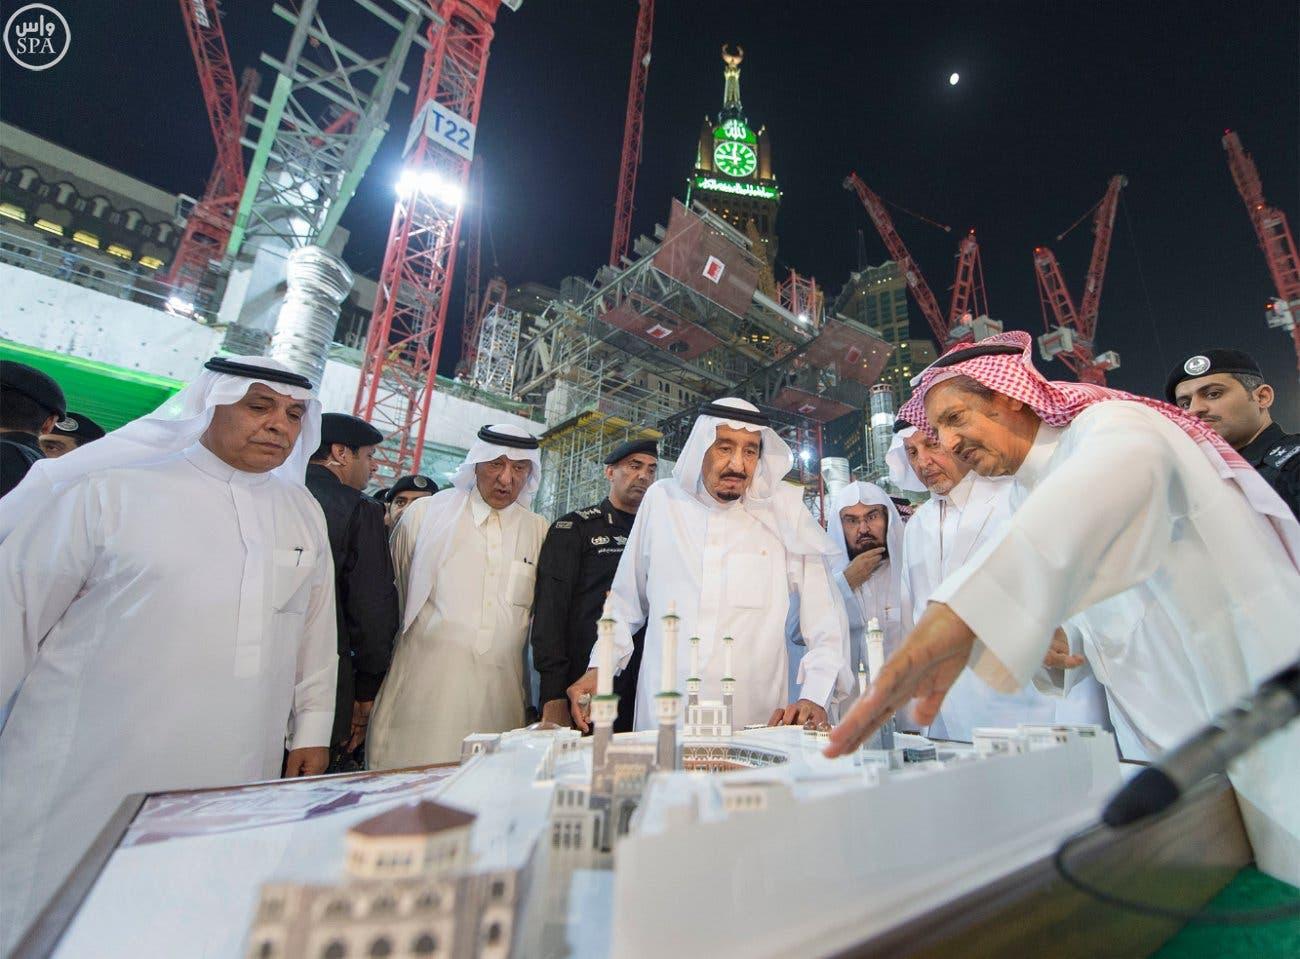 Arabian Prince, The* Arabian Prince - Innovative Life